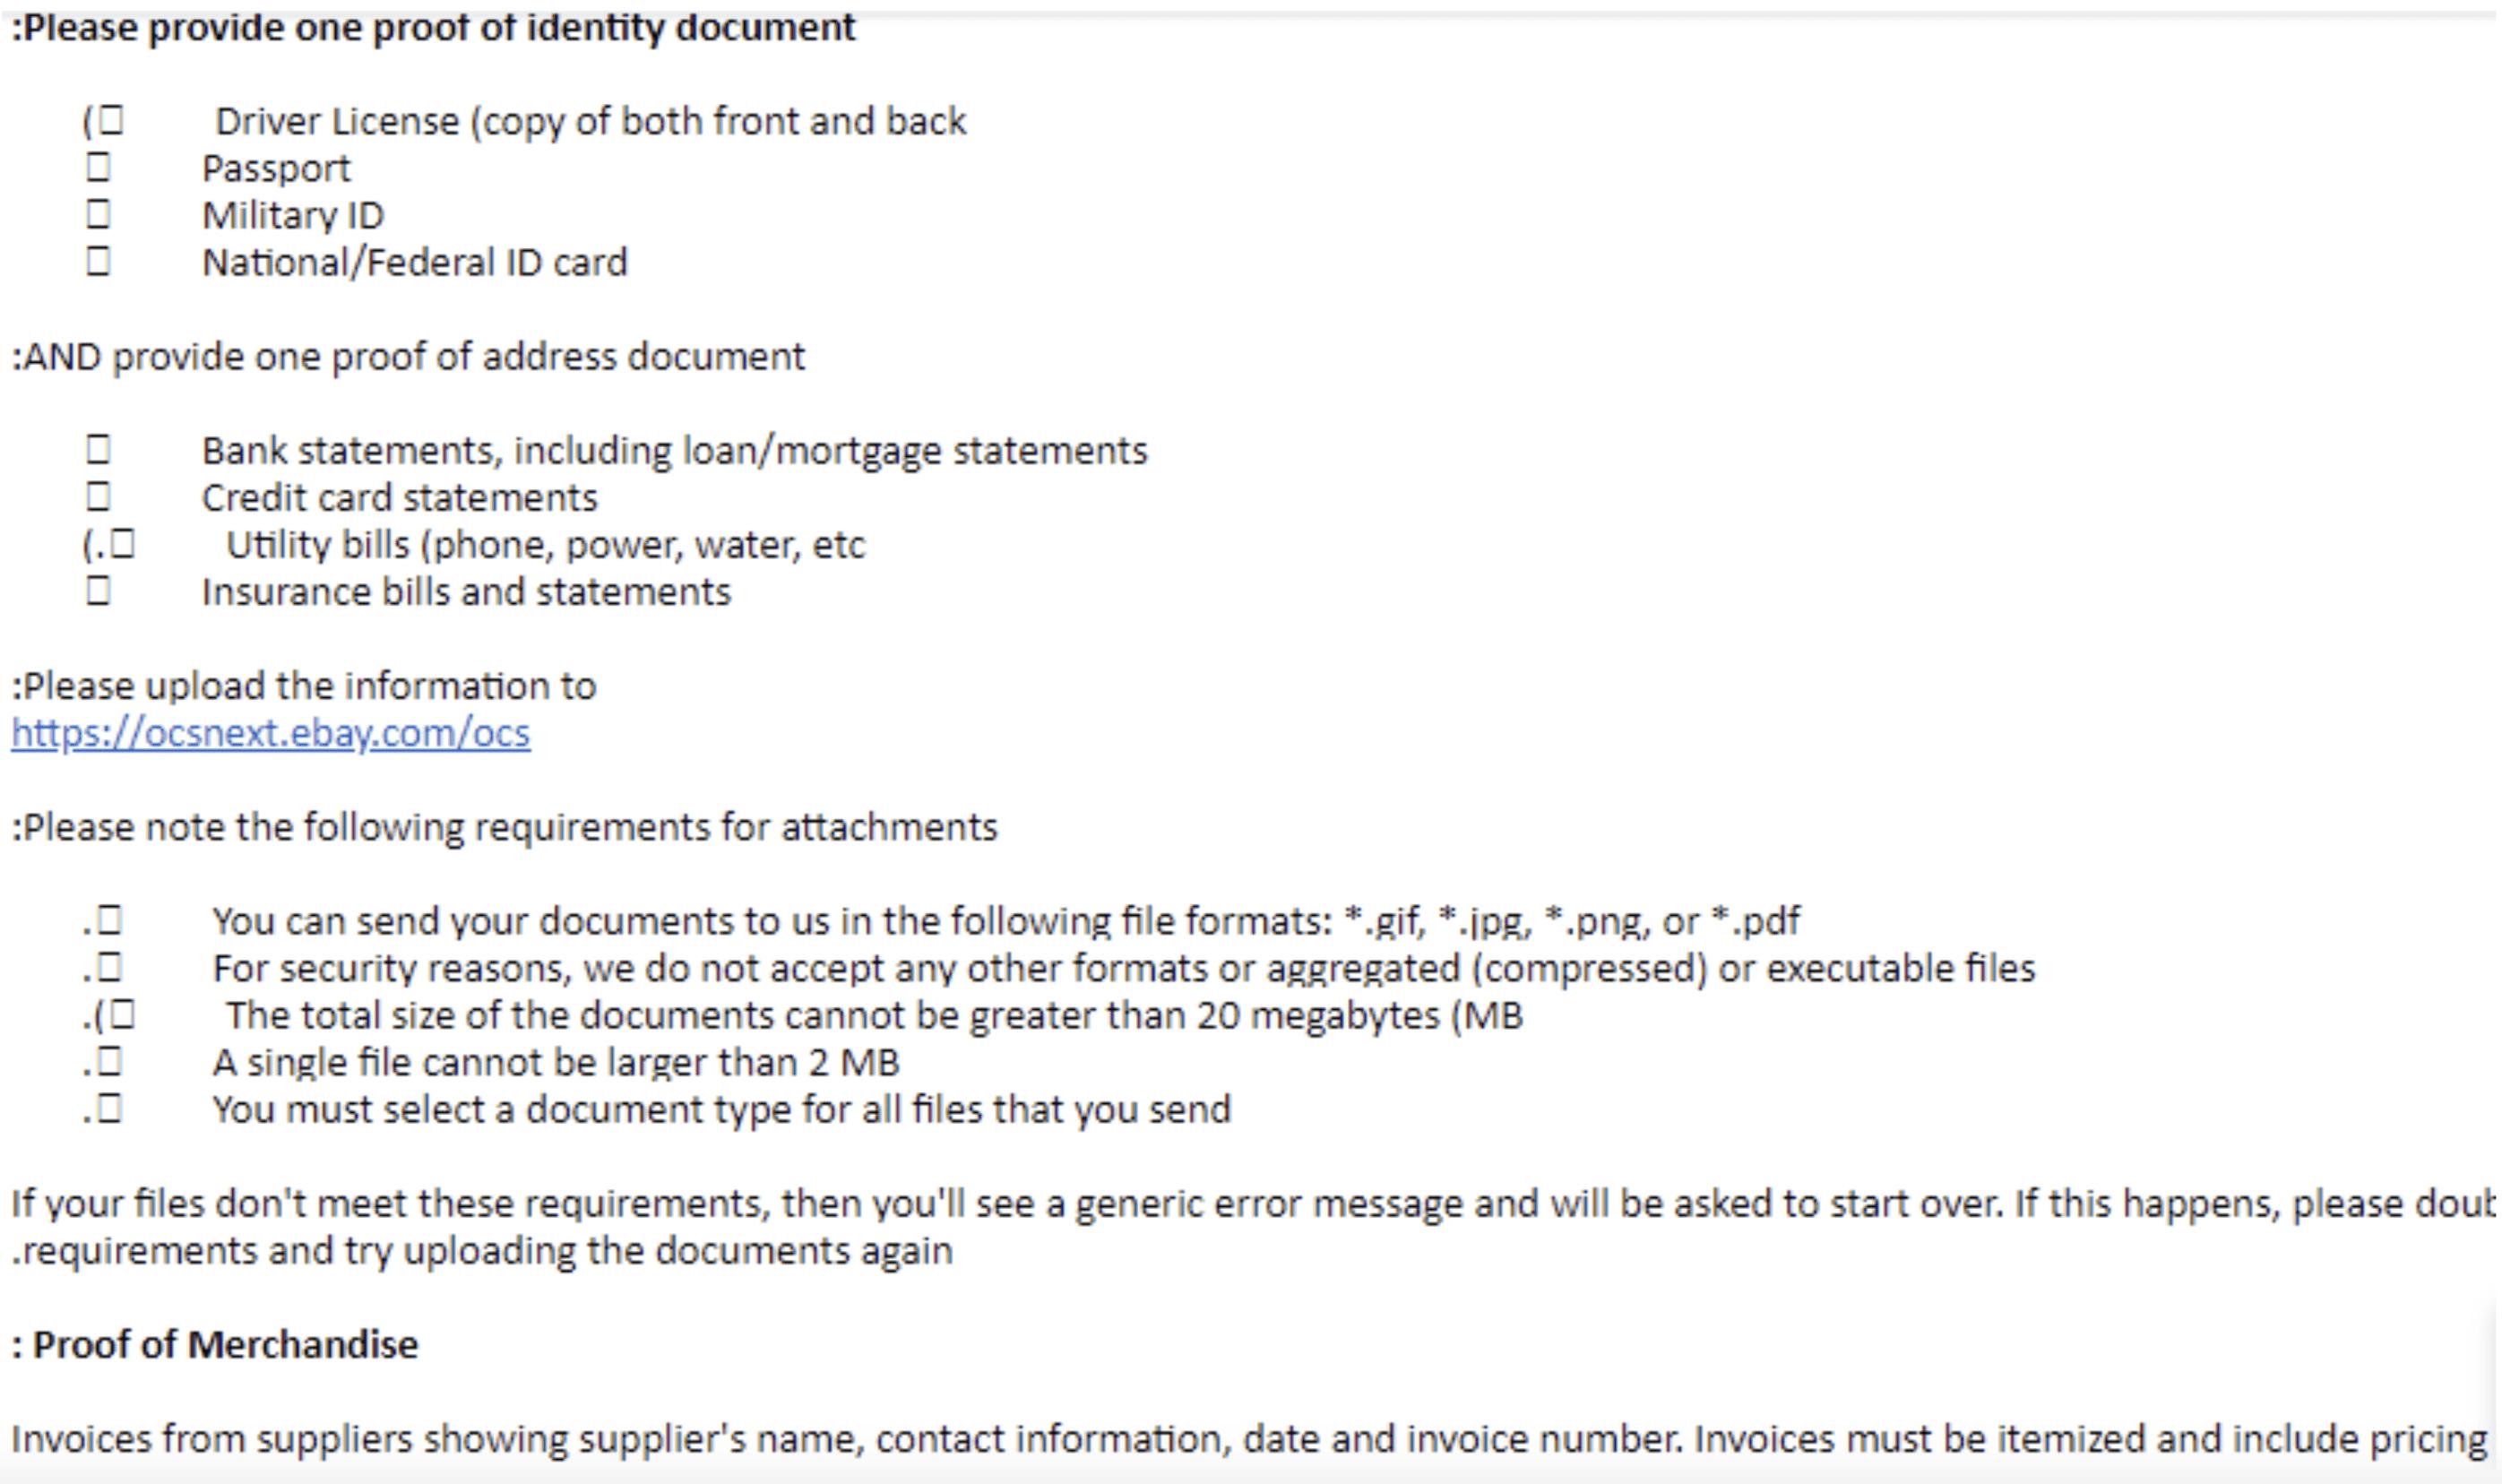 eBay restriction MC011 - Will I get my account back? (Full